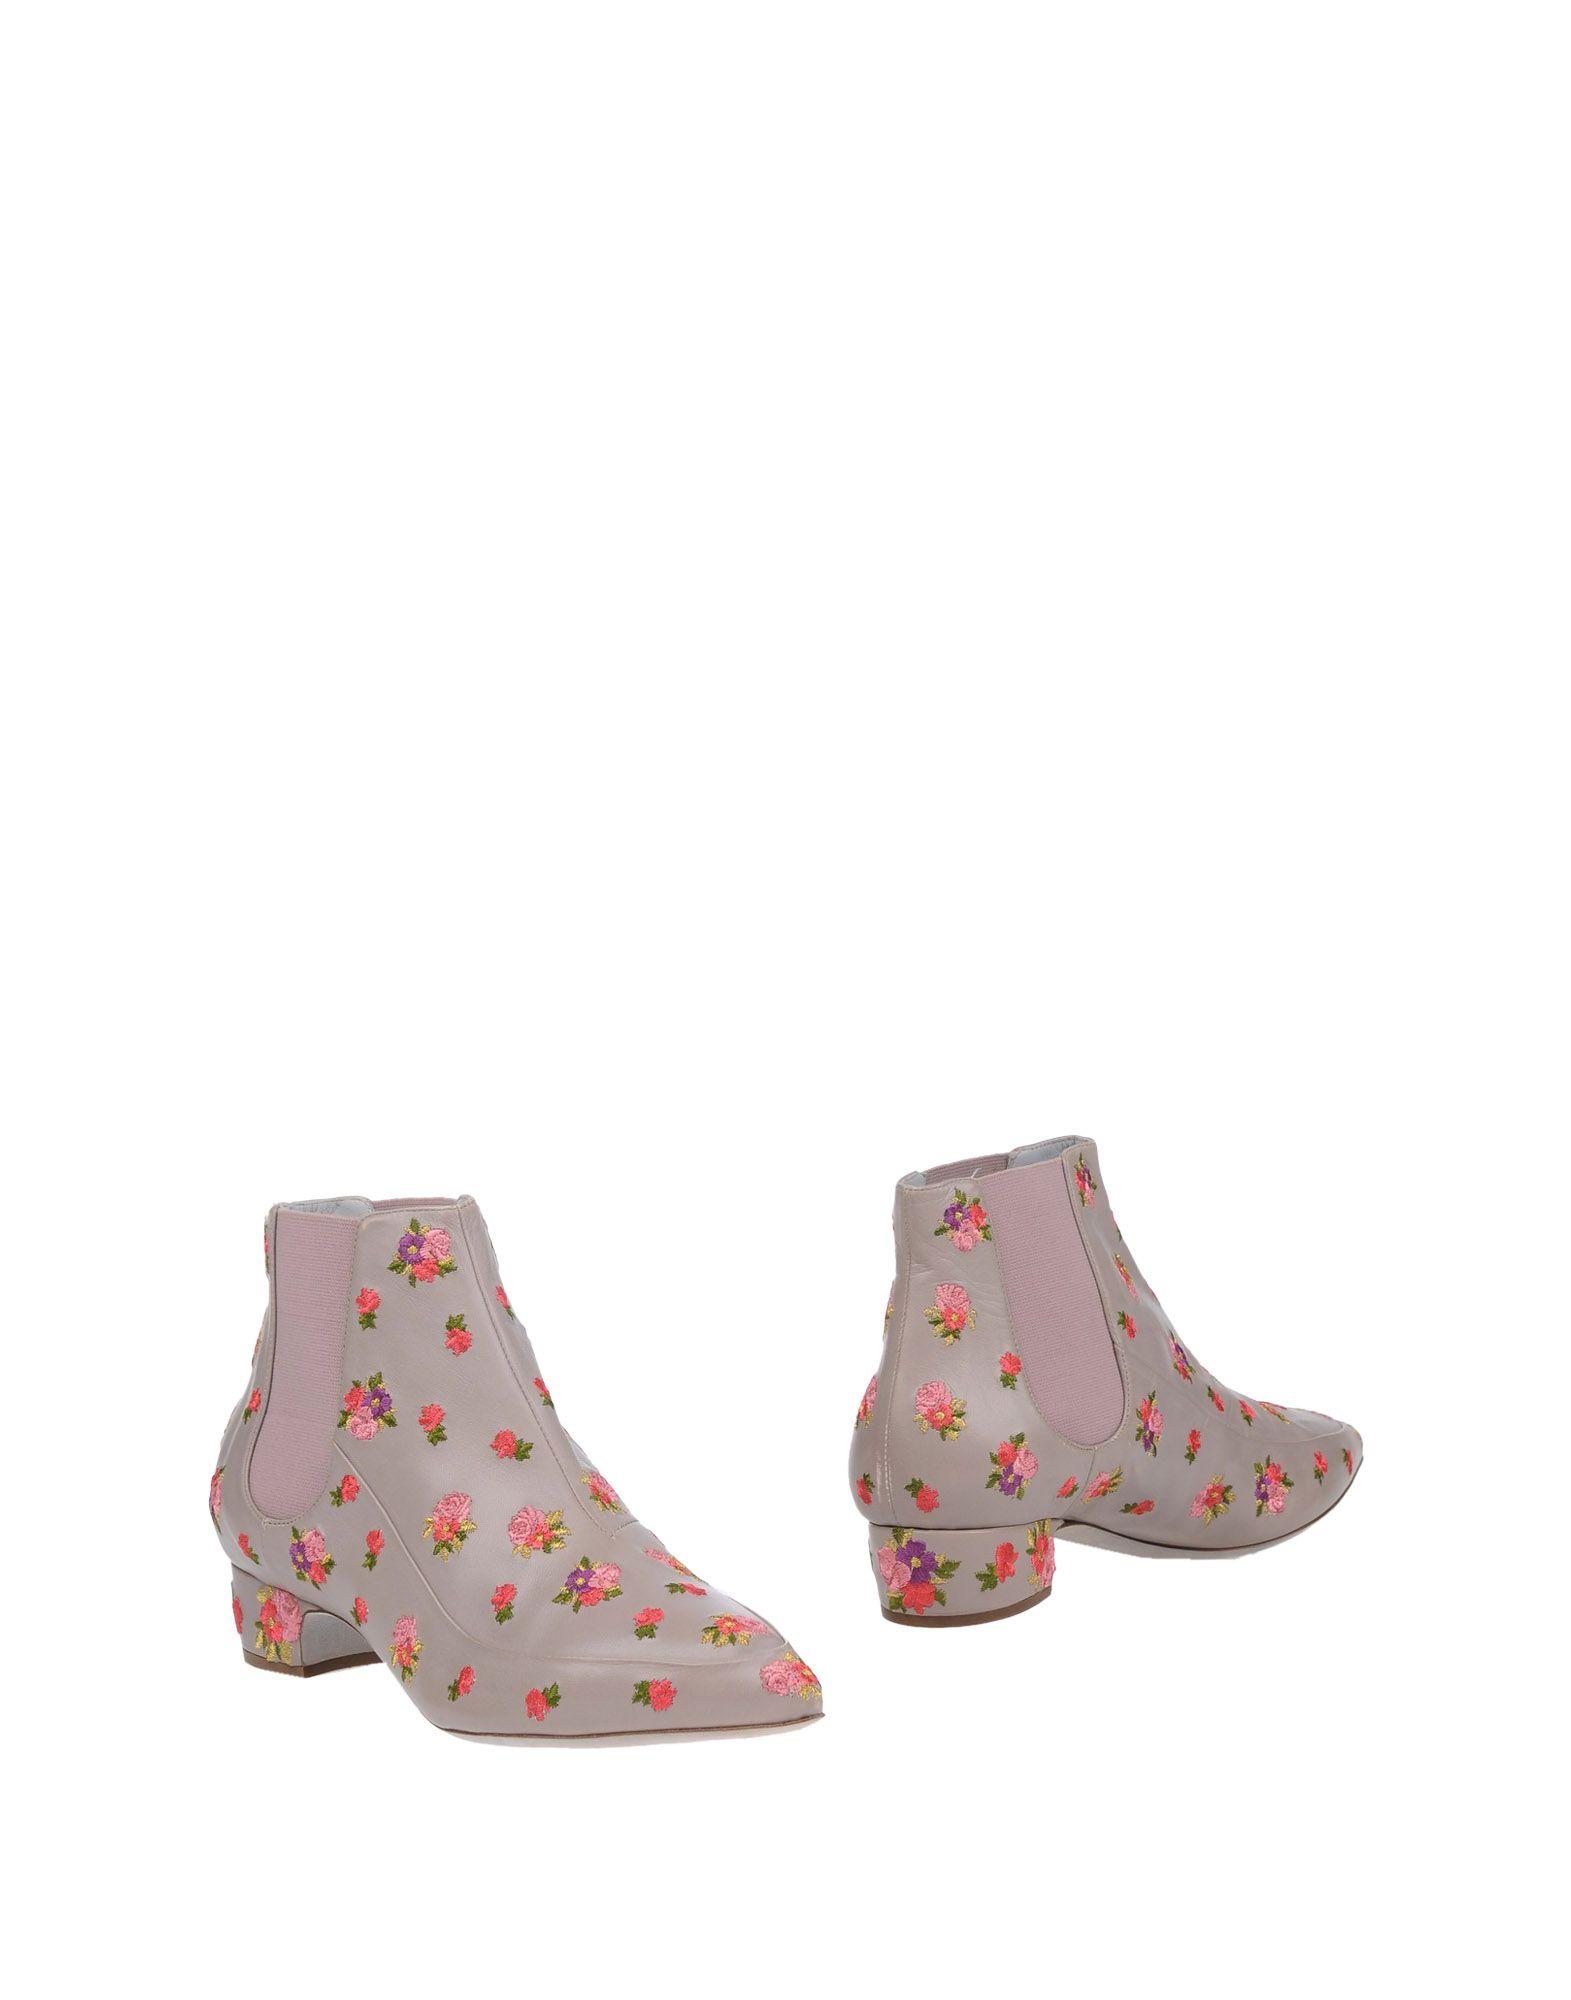 RAYNE Полусапоги и высокие ботинки magazzini del sale полусапоги и высокие ботинки